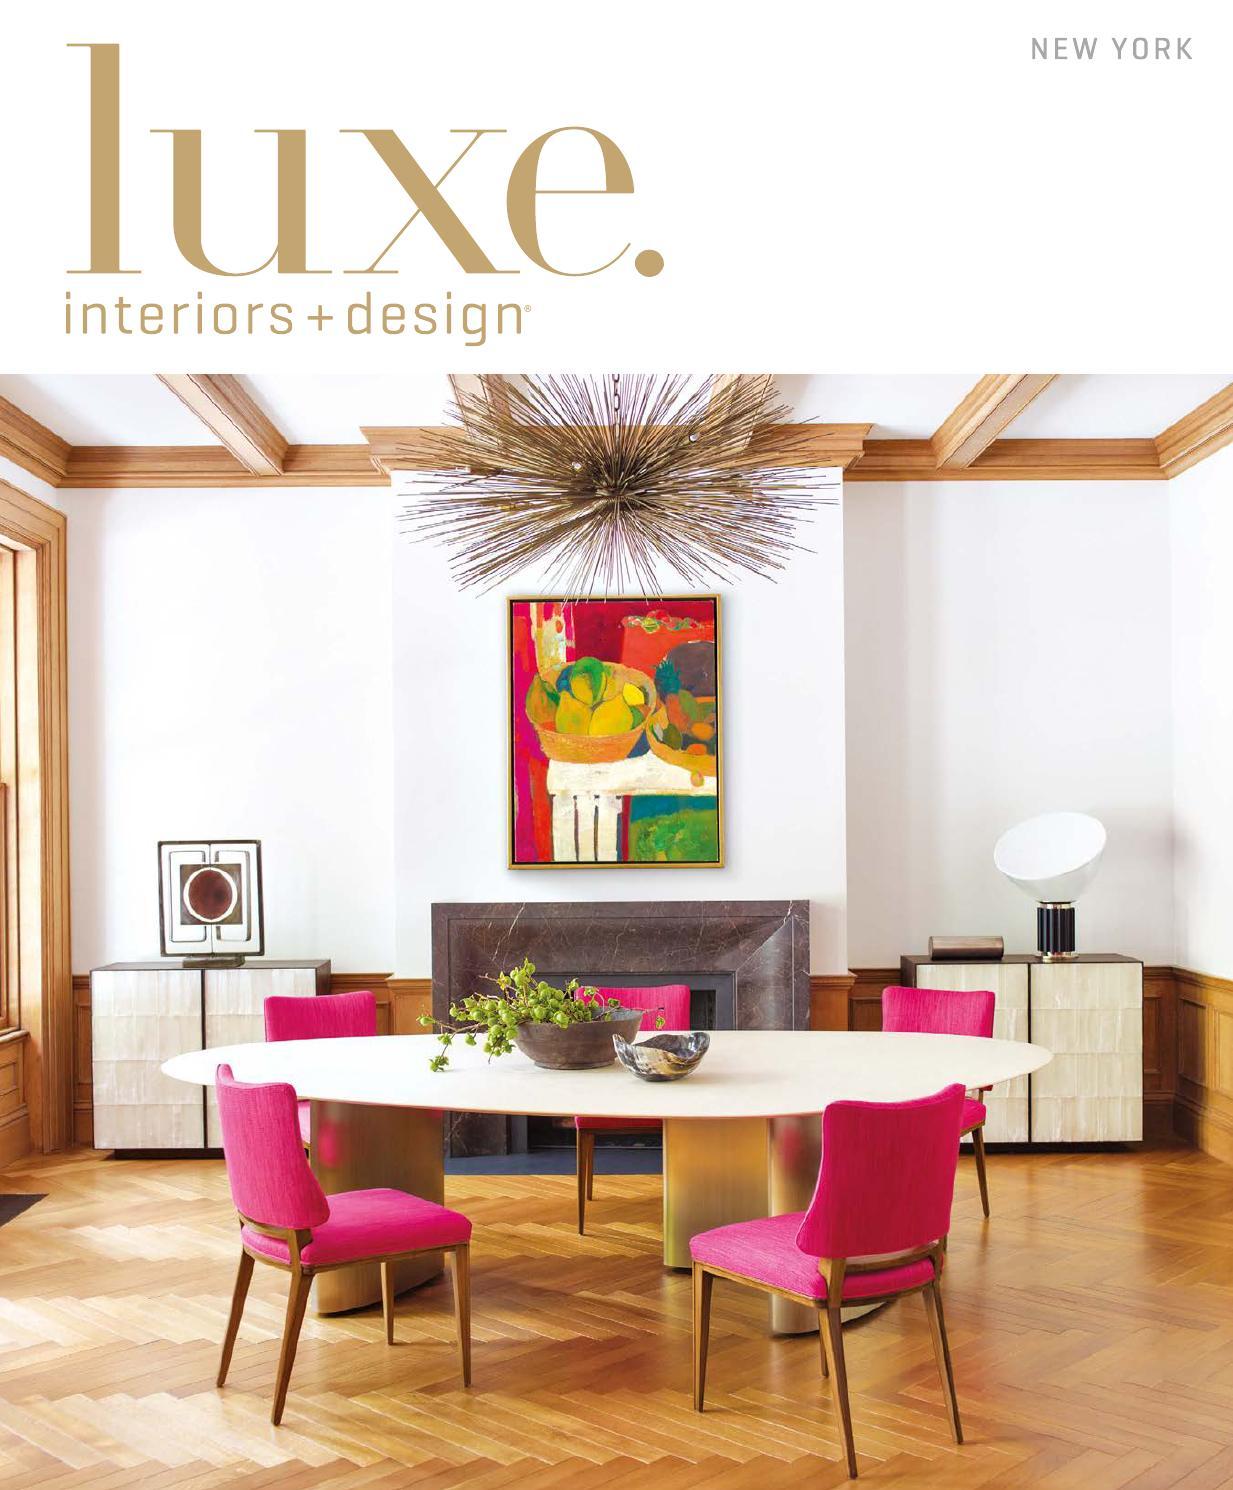 Luxe magazine september 2015 new york by sandow issuu